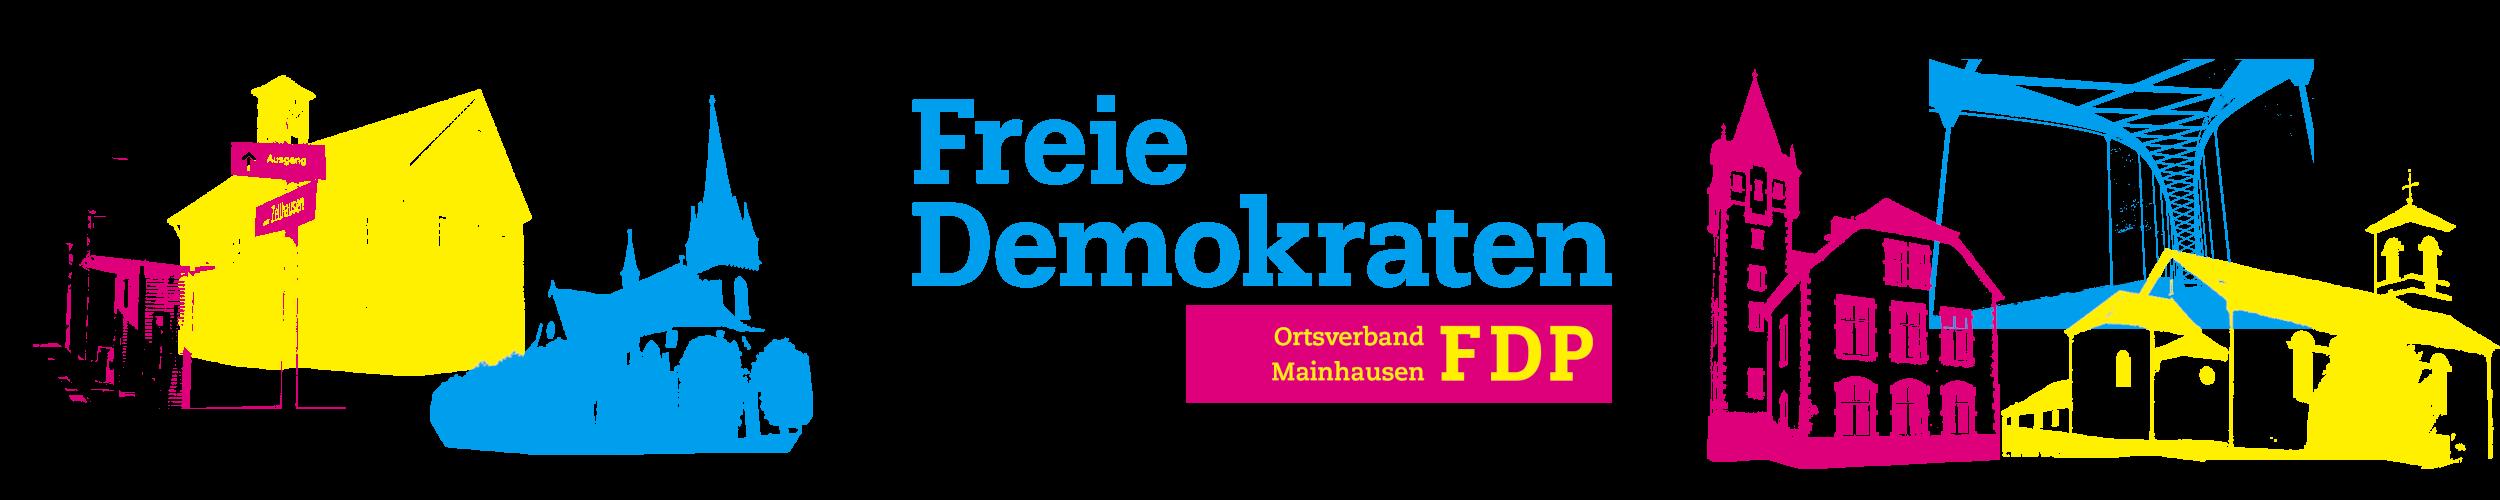 FDP Mainhausen